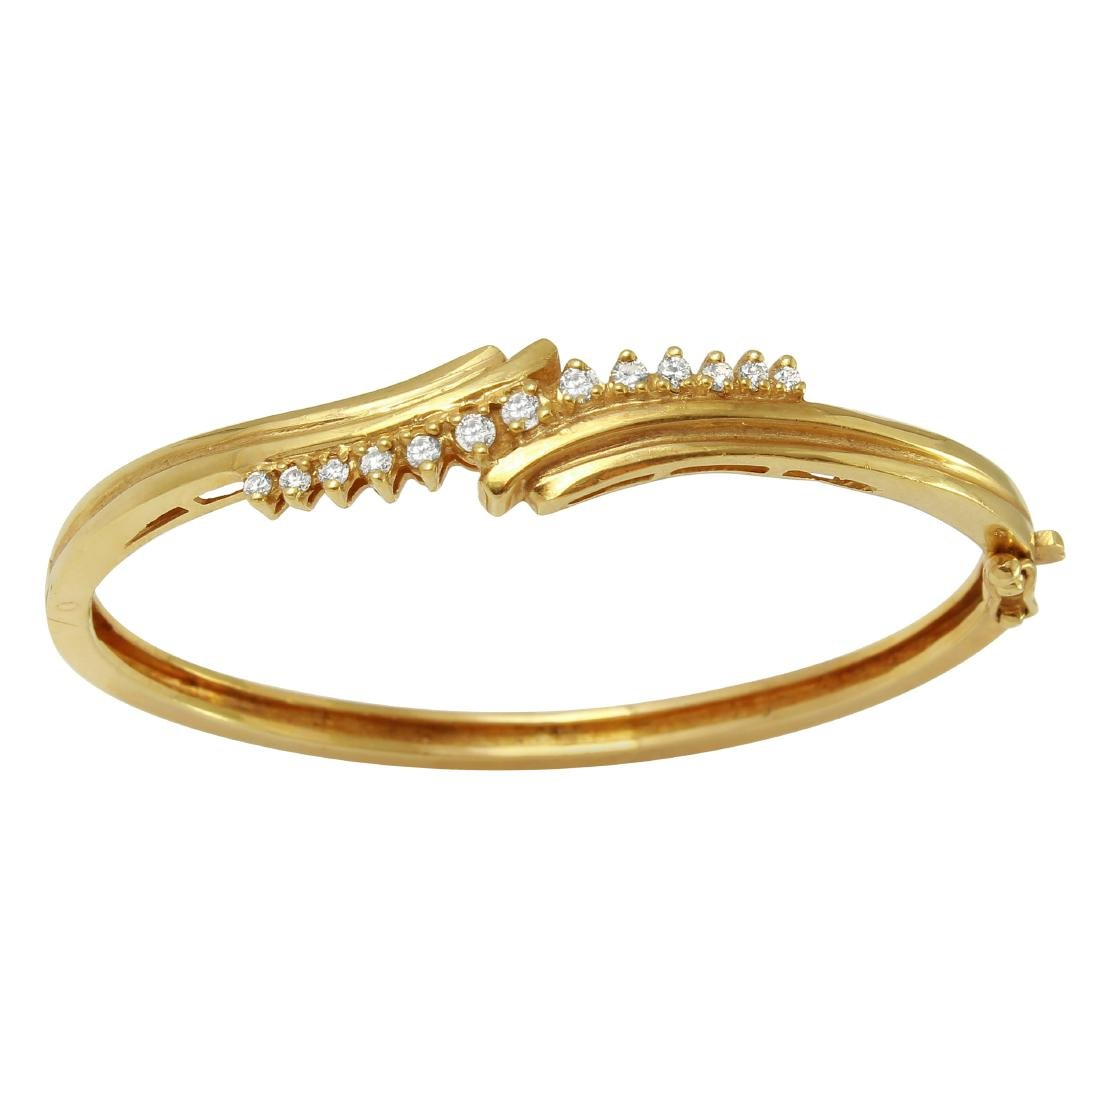 14KT Yellow Gold Diamond Bangle Bracelet - 3